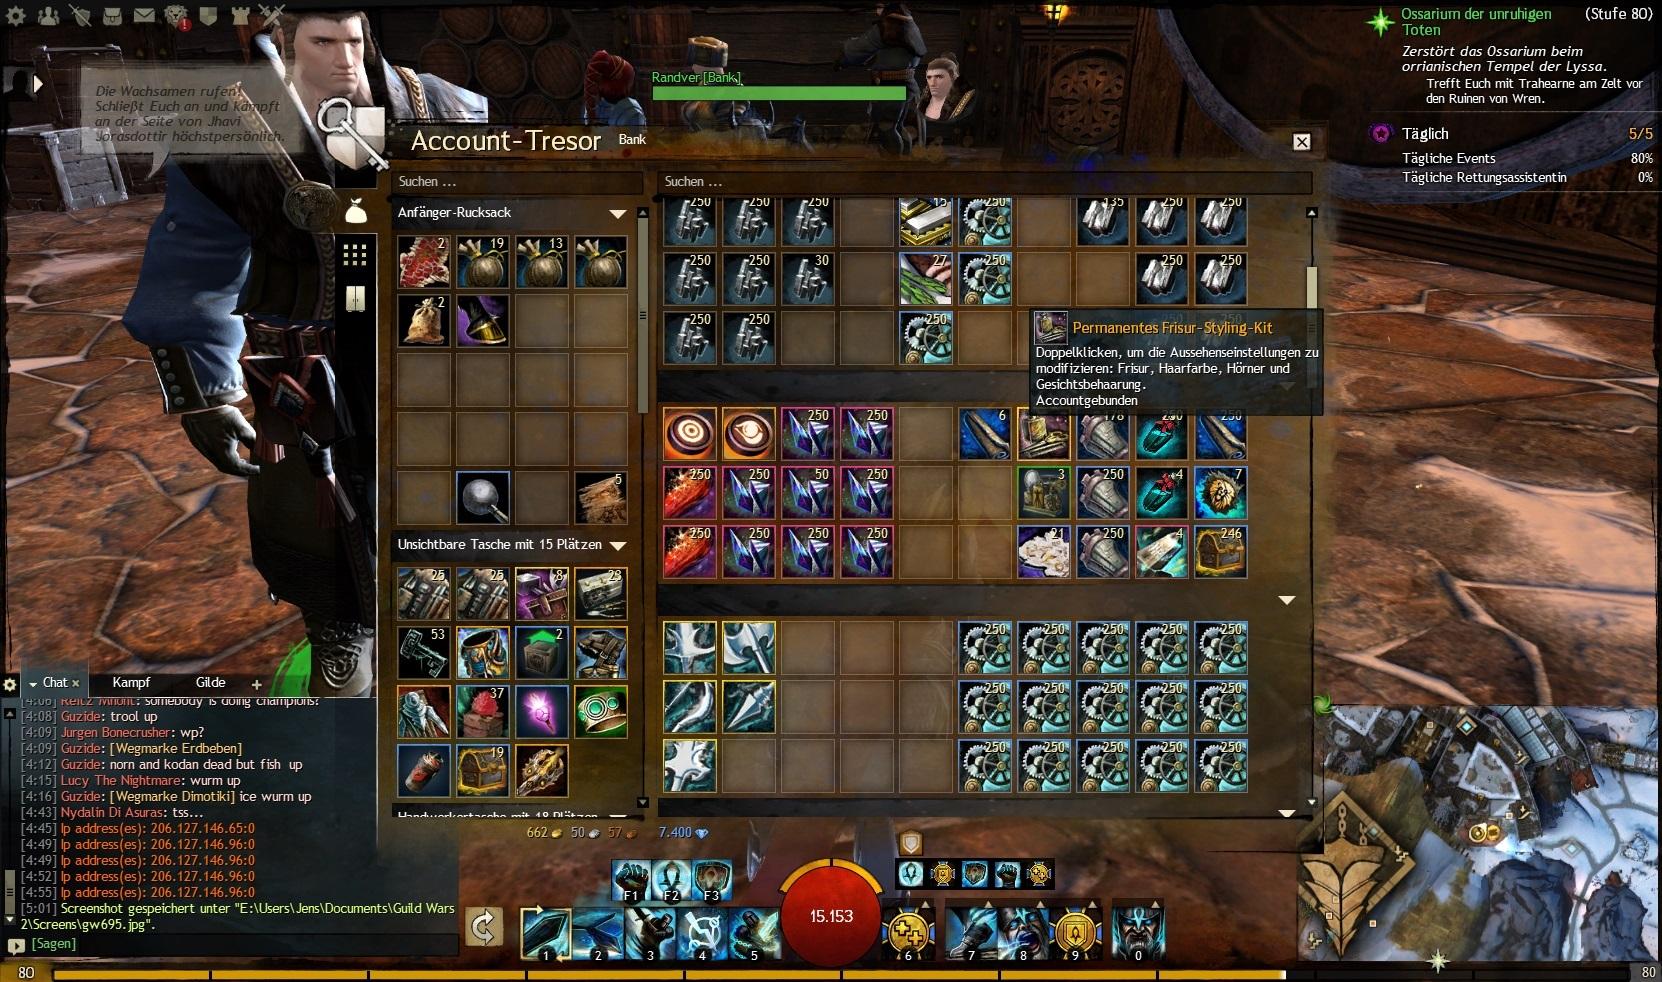 guild wars 2 forum - black lion trading co - permanent hair style